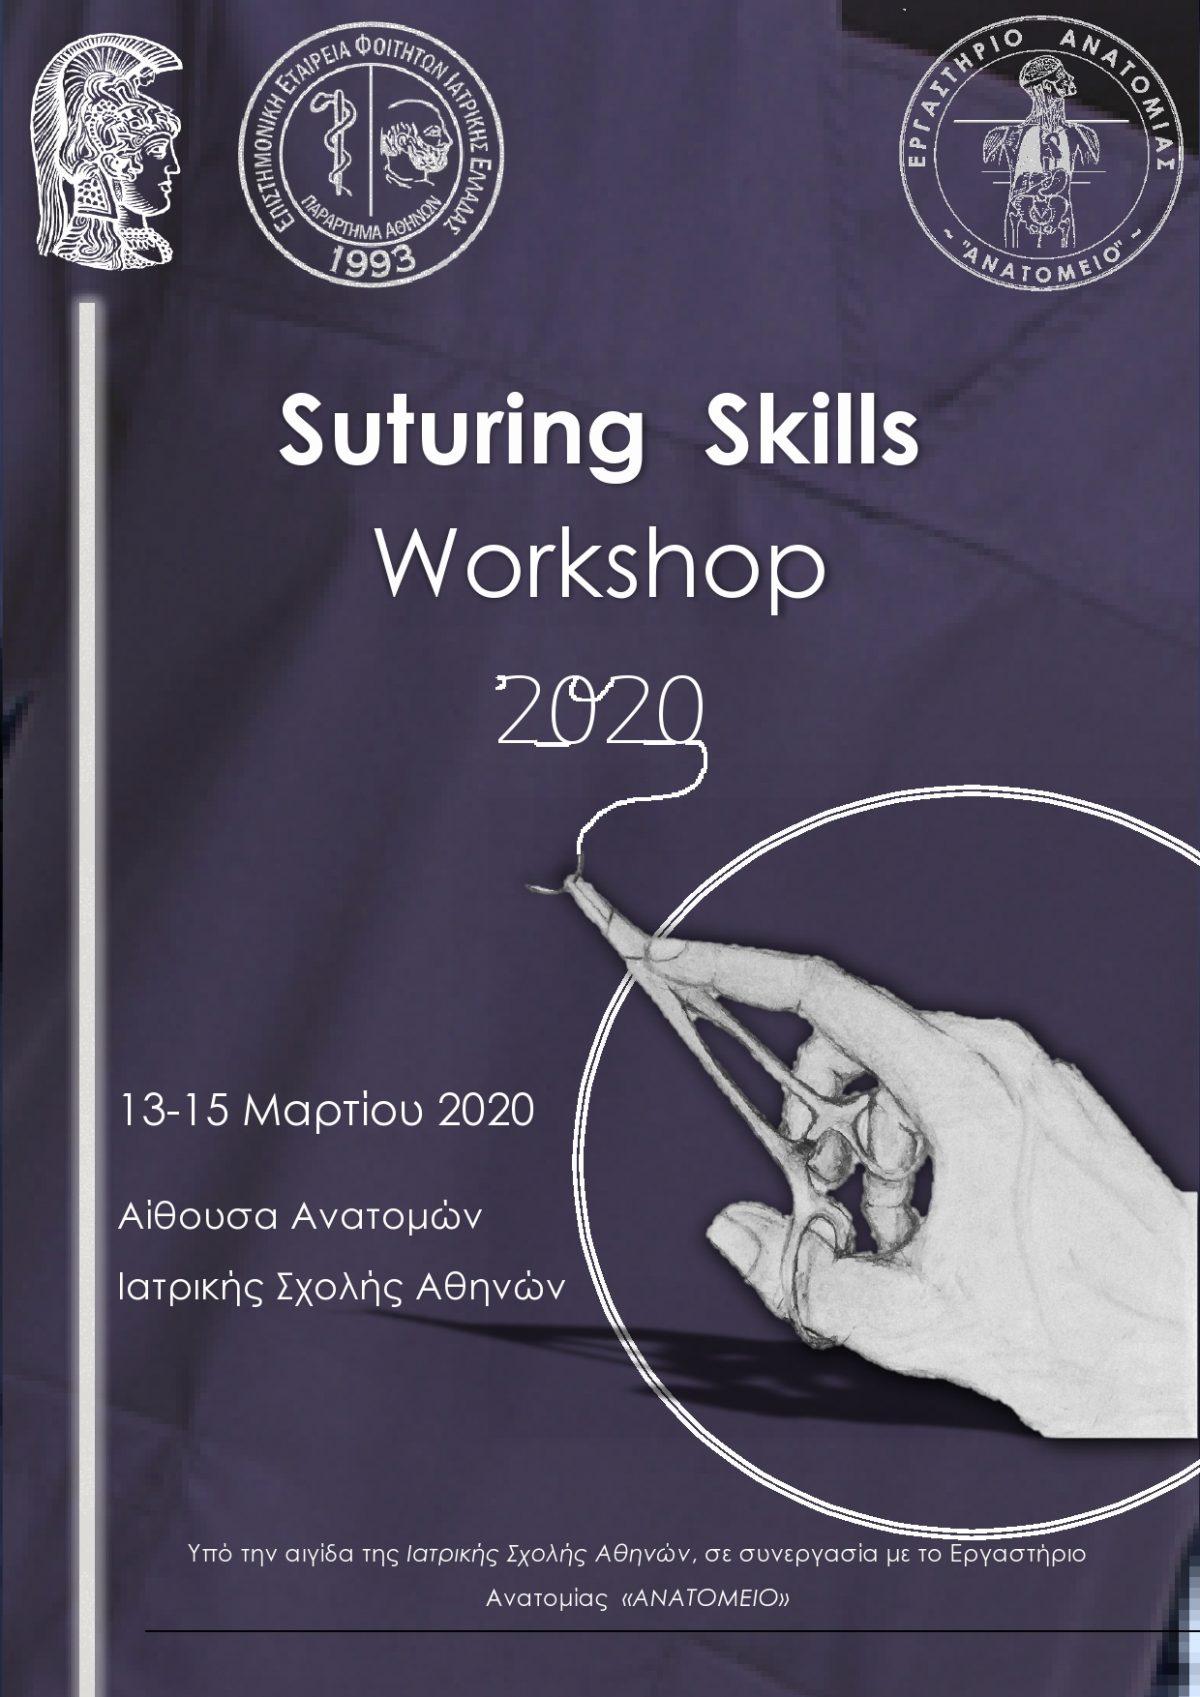 SUTURING SKILLS WORKSHOP 2020